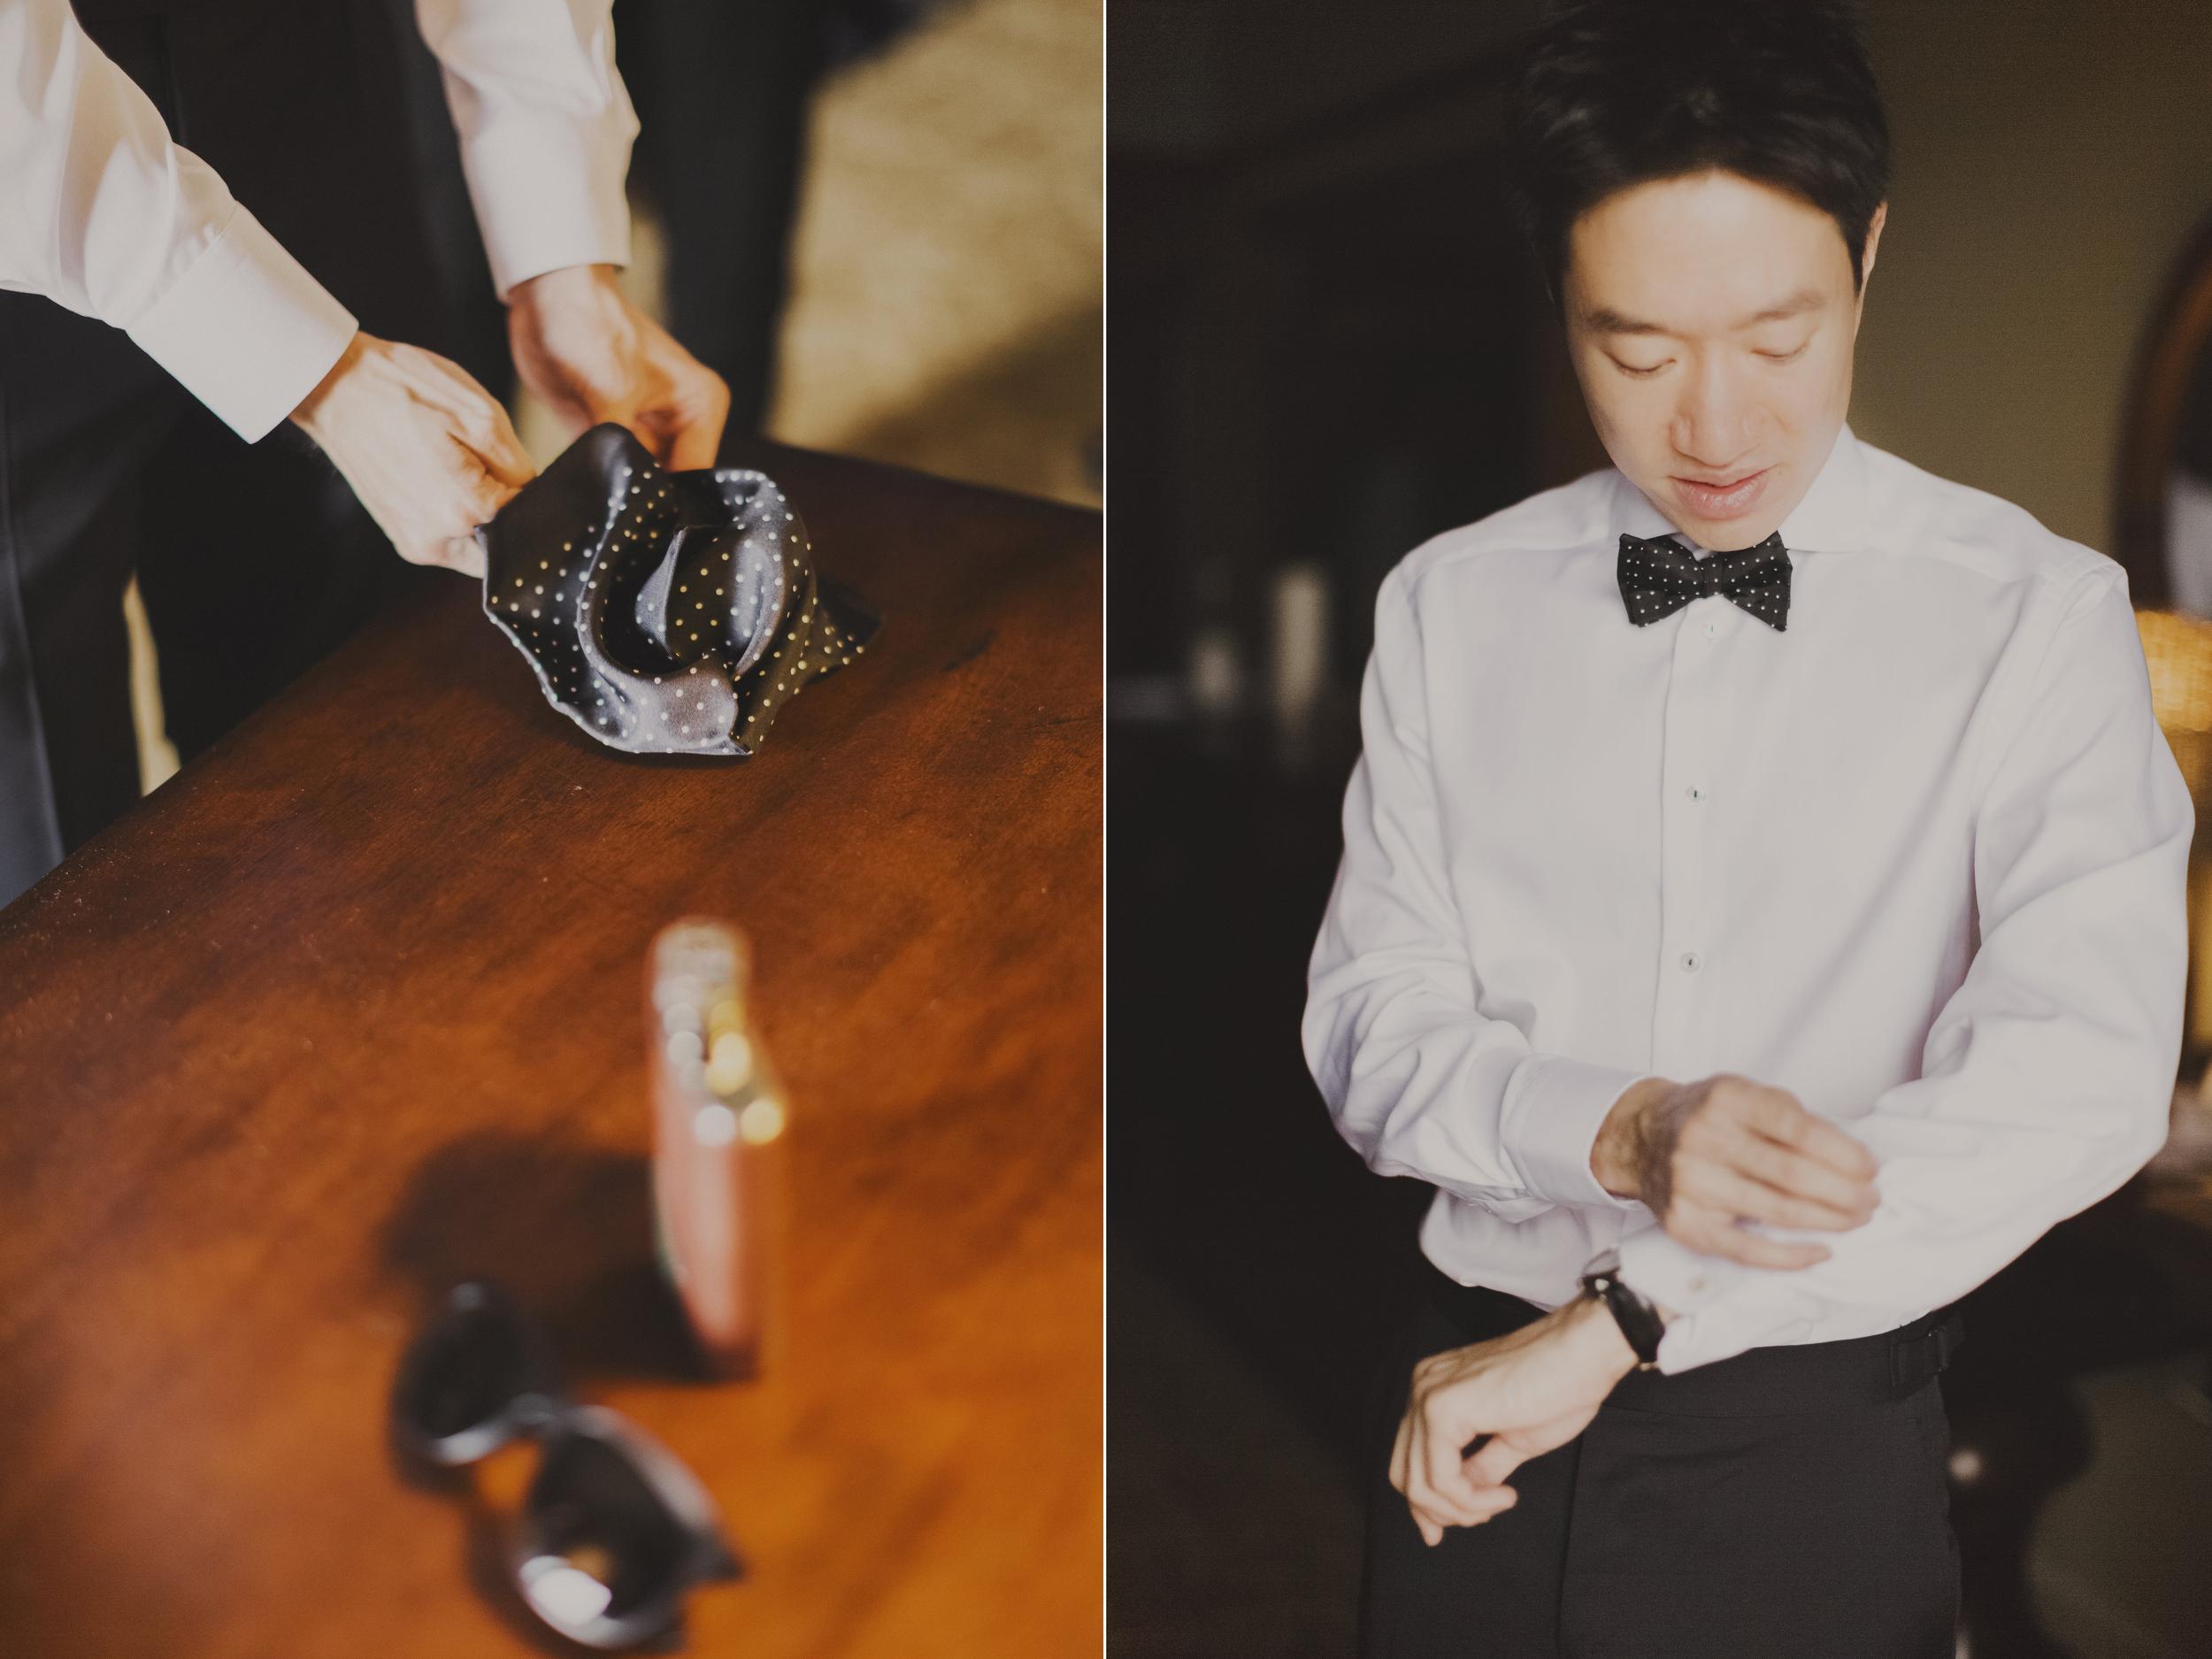 angie-diaz-photography-oahu-wedding-lanikuhonoa-shenshen-marshall-15.jpg